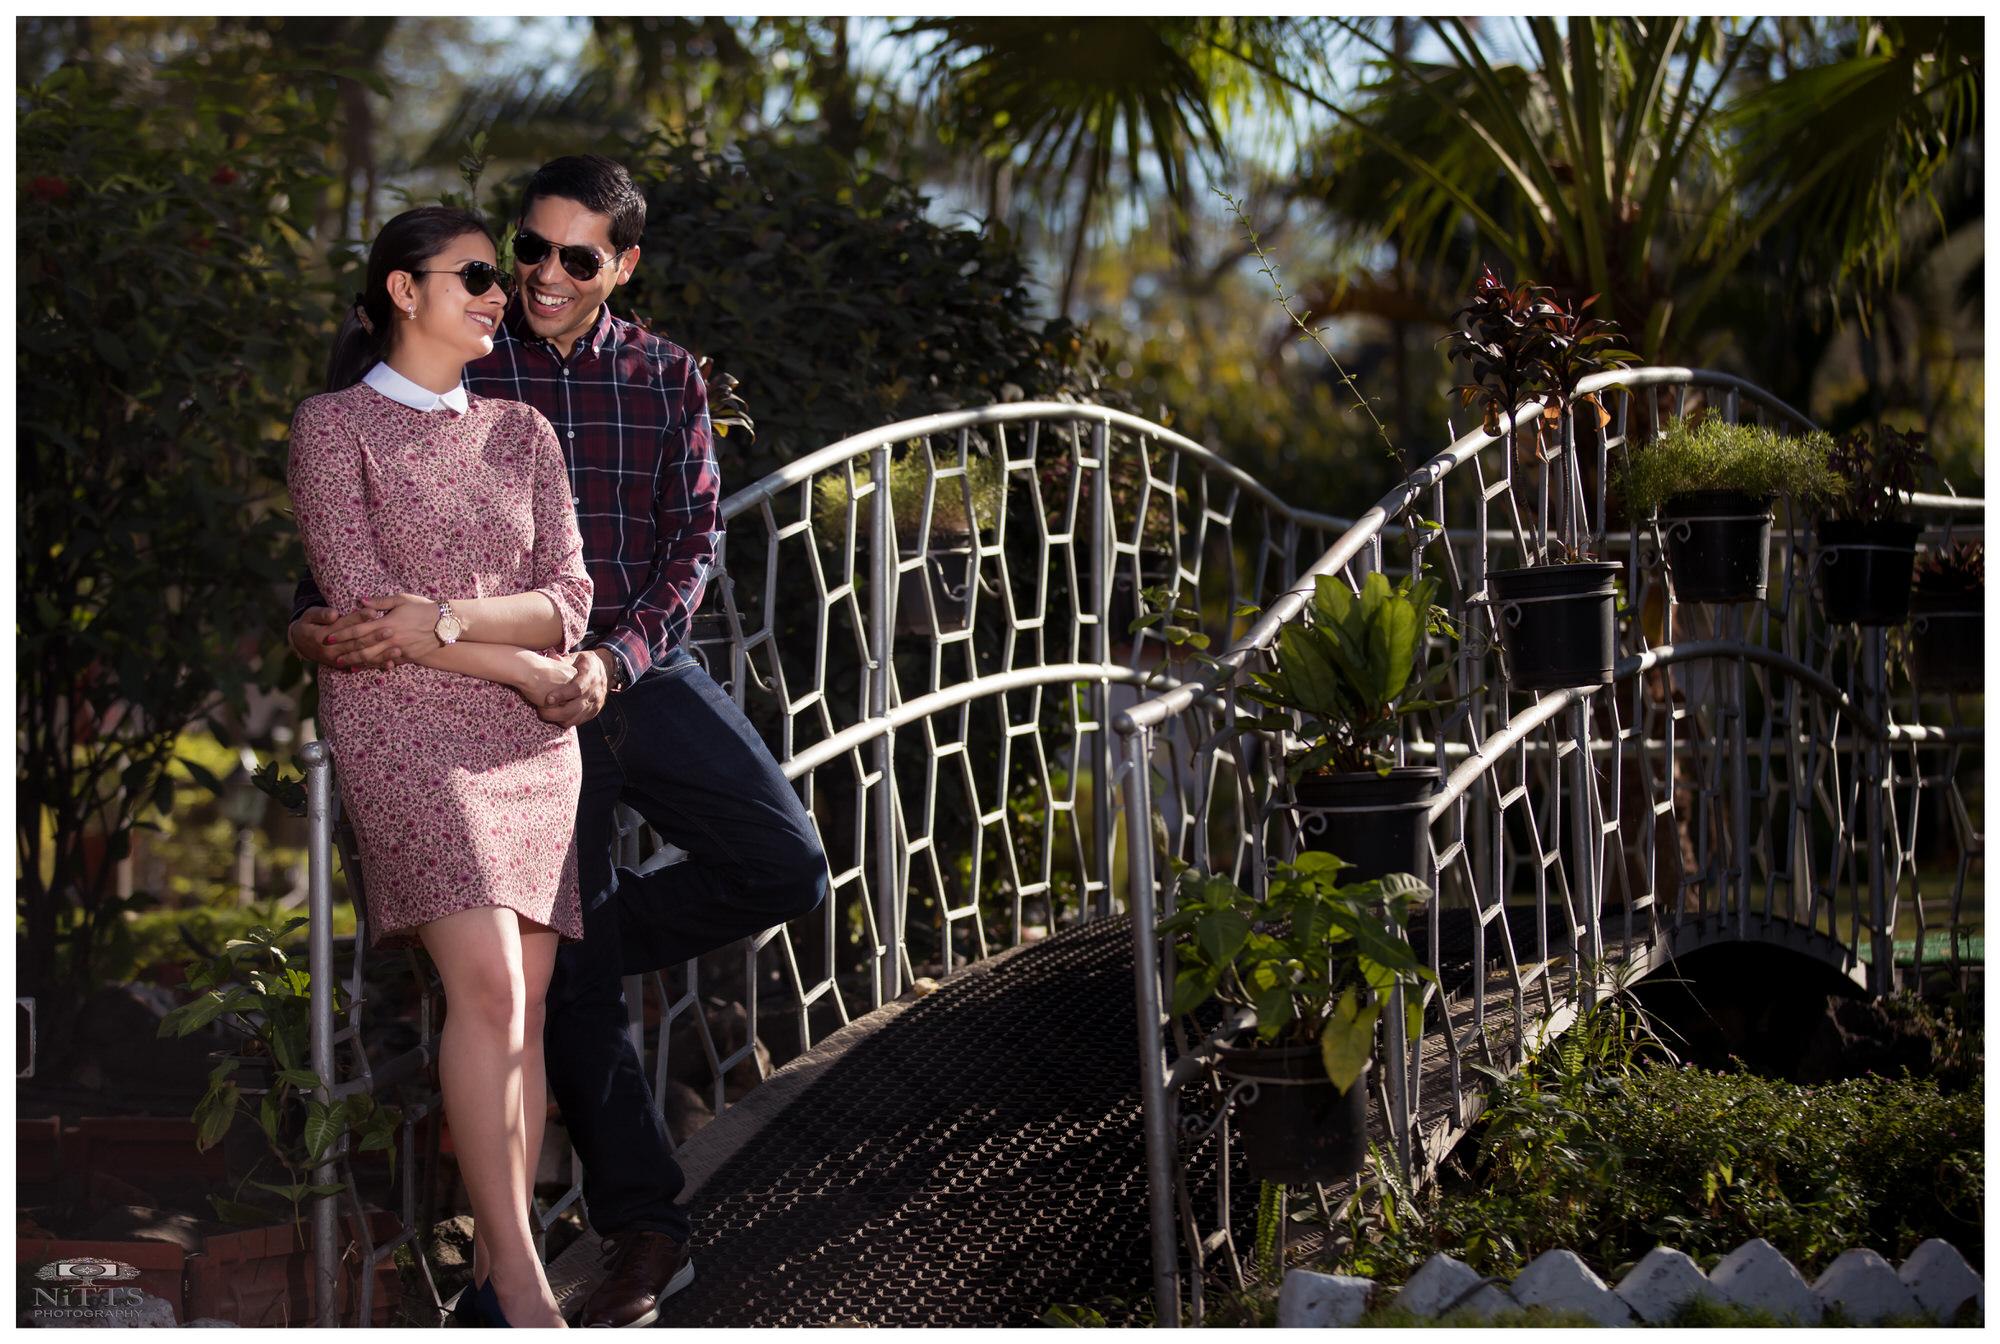 Karishma & Suhas (Pre-wedding)-February 12, 2018-47.JPG